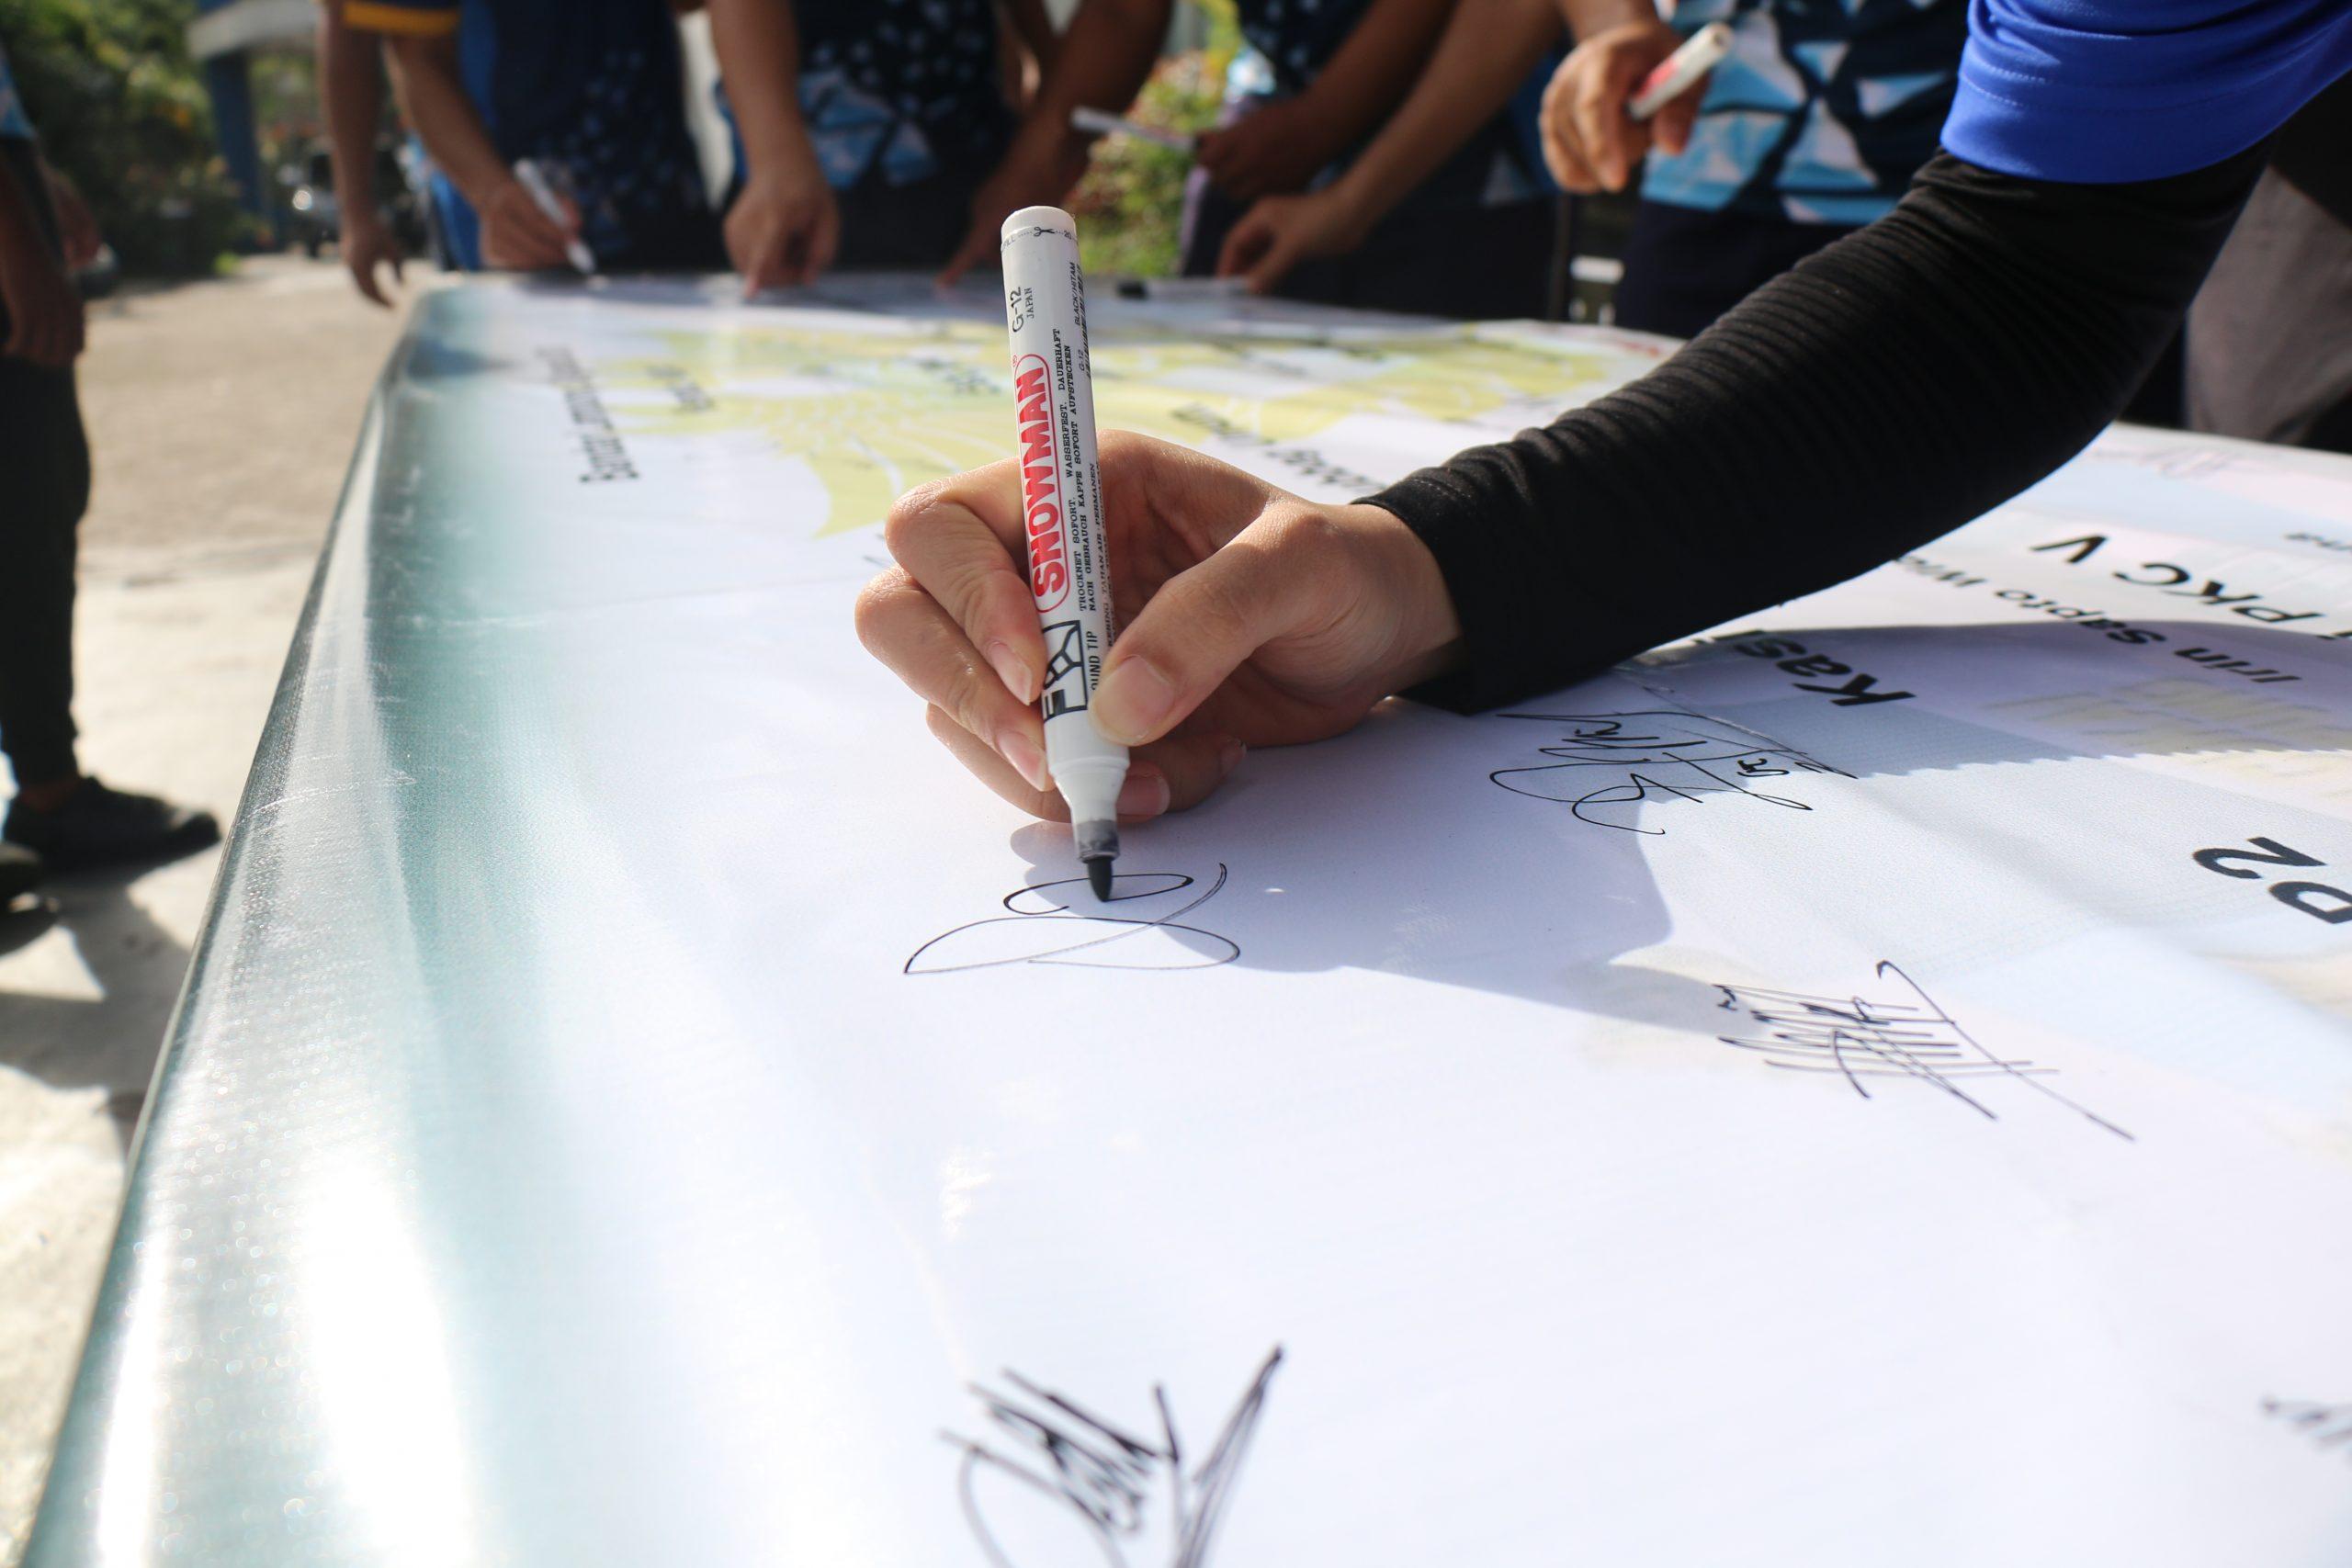 Dengan Tagline Barunya Bea Cukai Bandar Lampung Semangat Membangun Zona Integritas Menuju WBK/WBBM